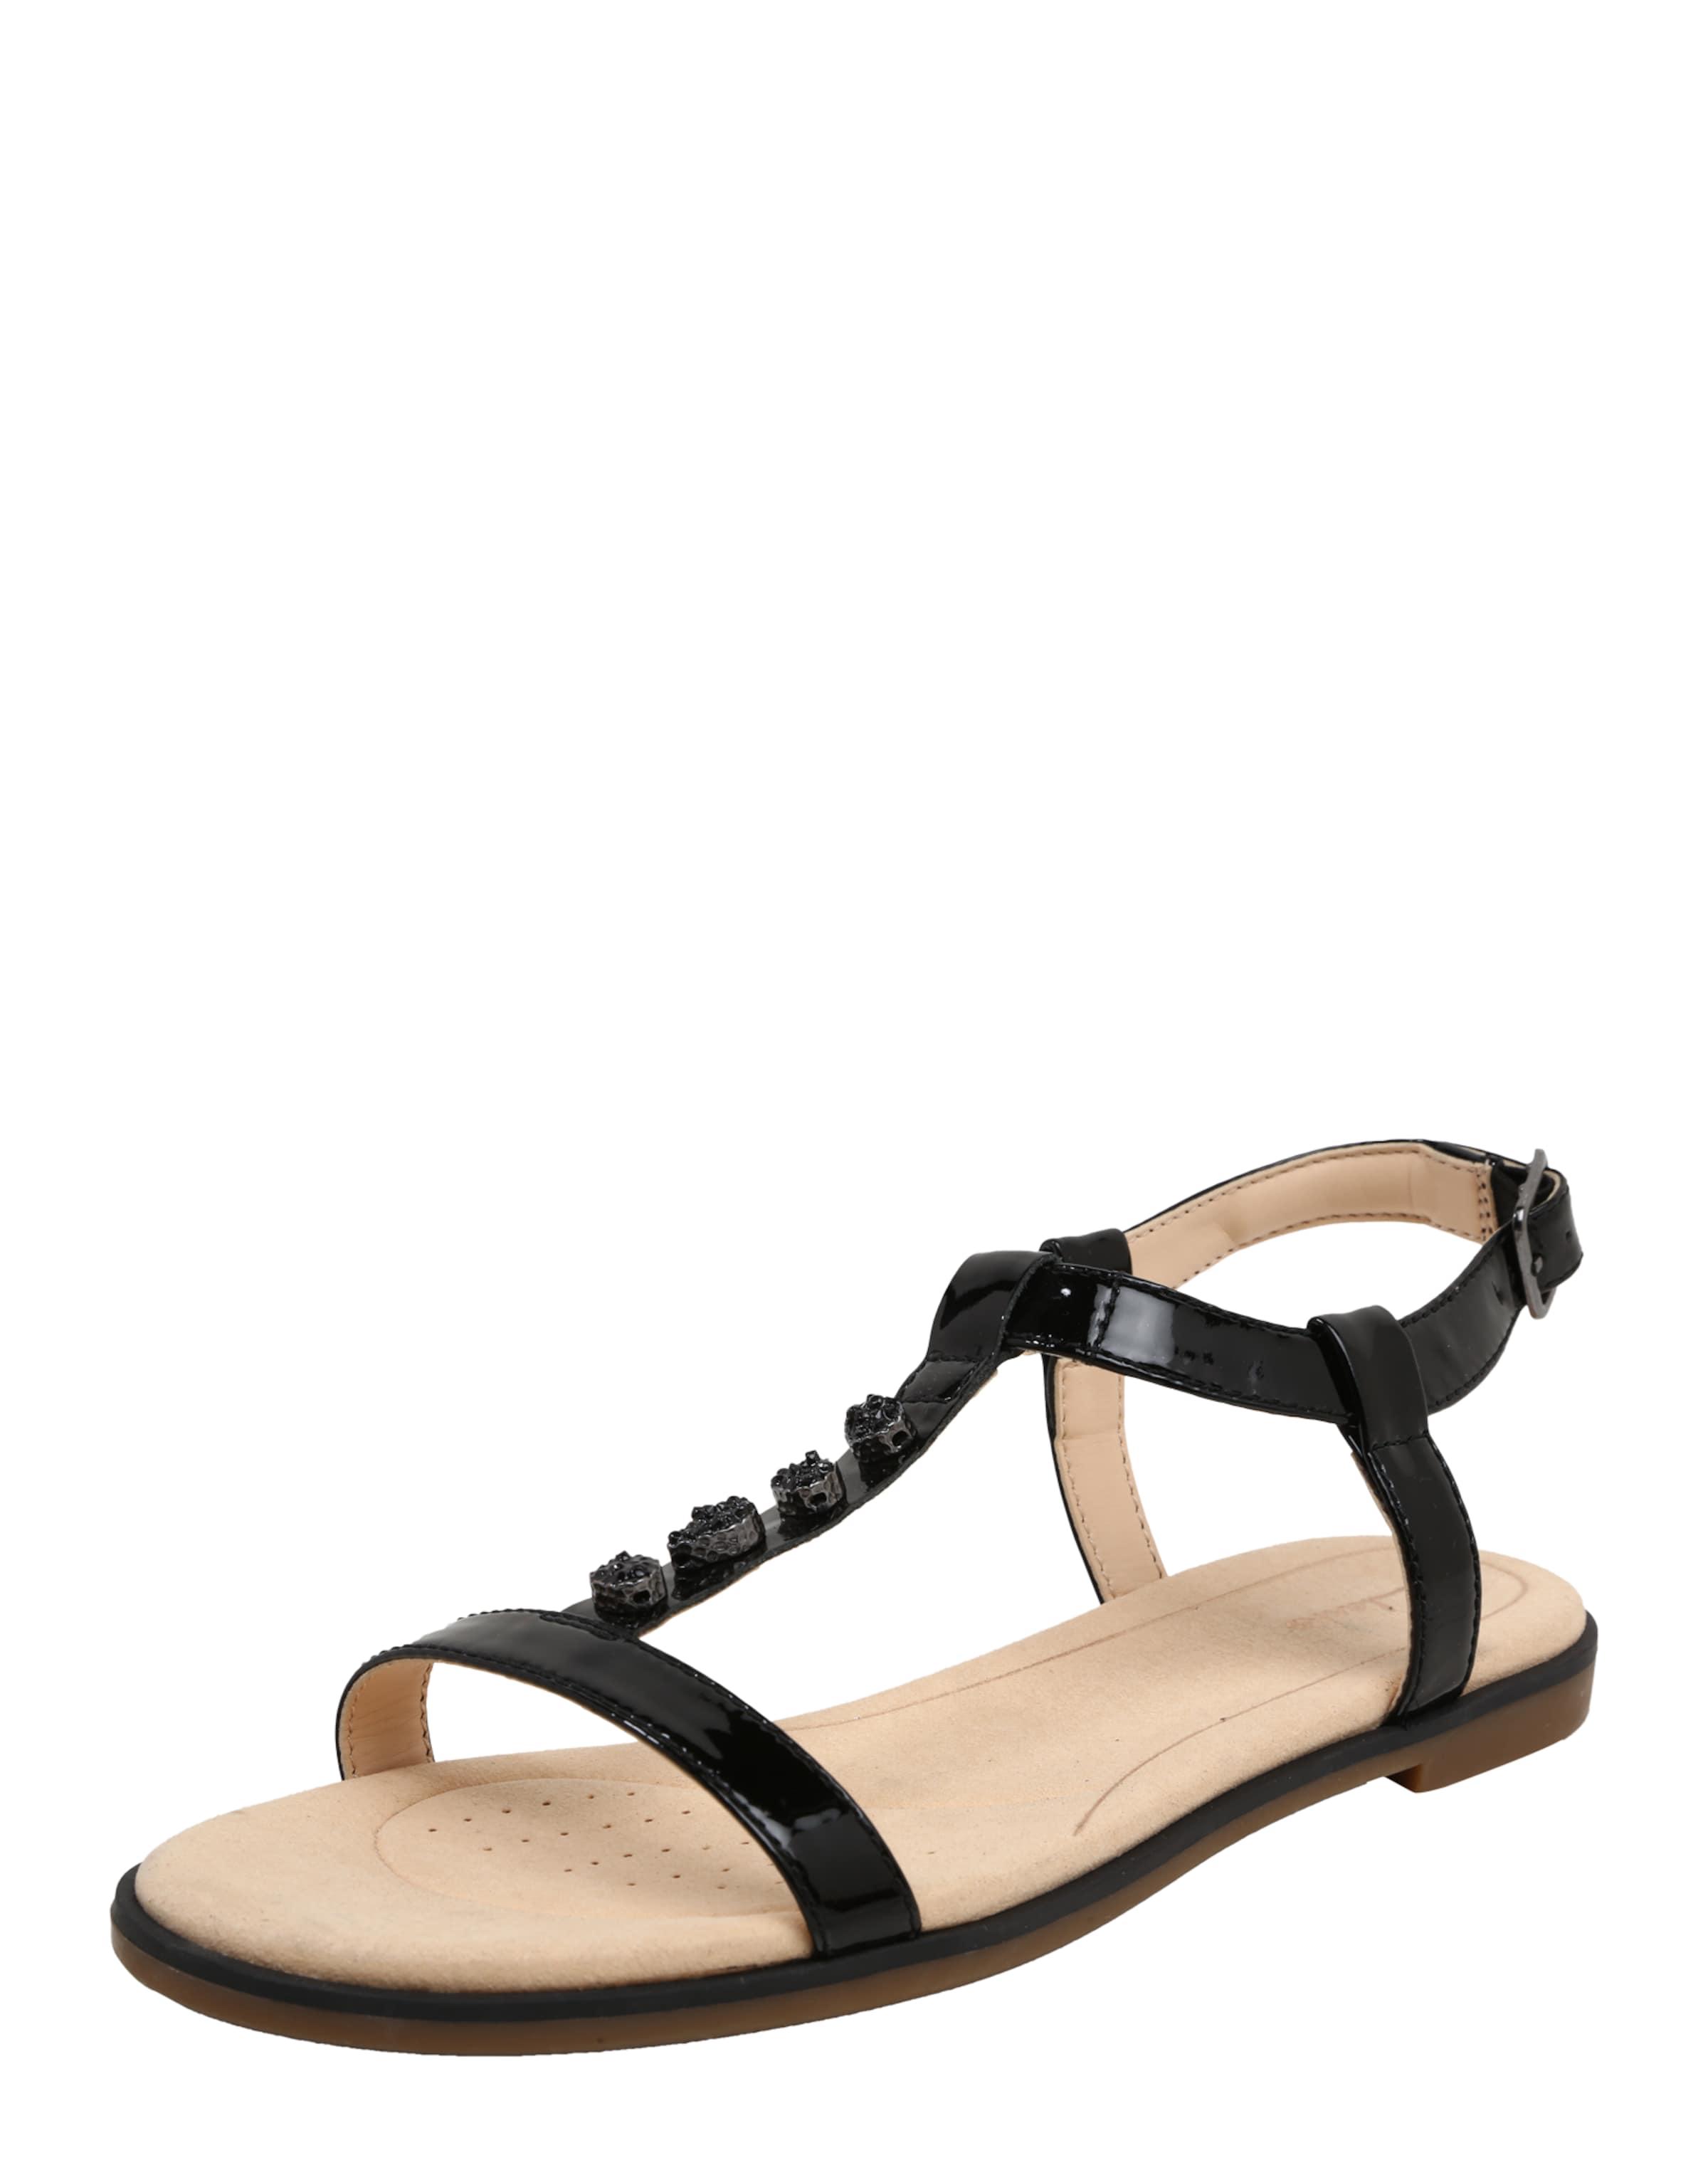 Sandales Avec Clarks Beige De Ceinture